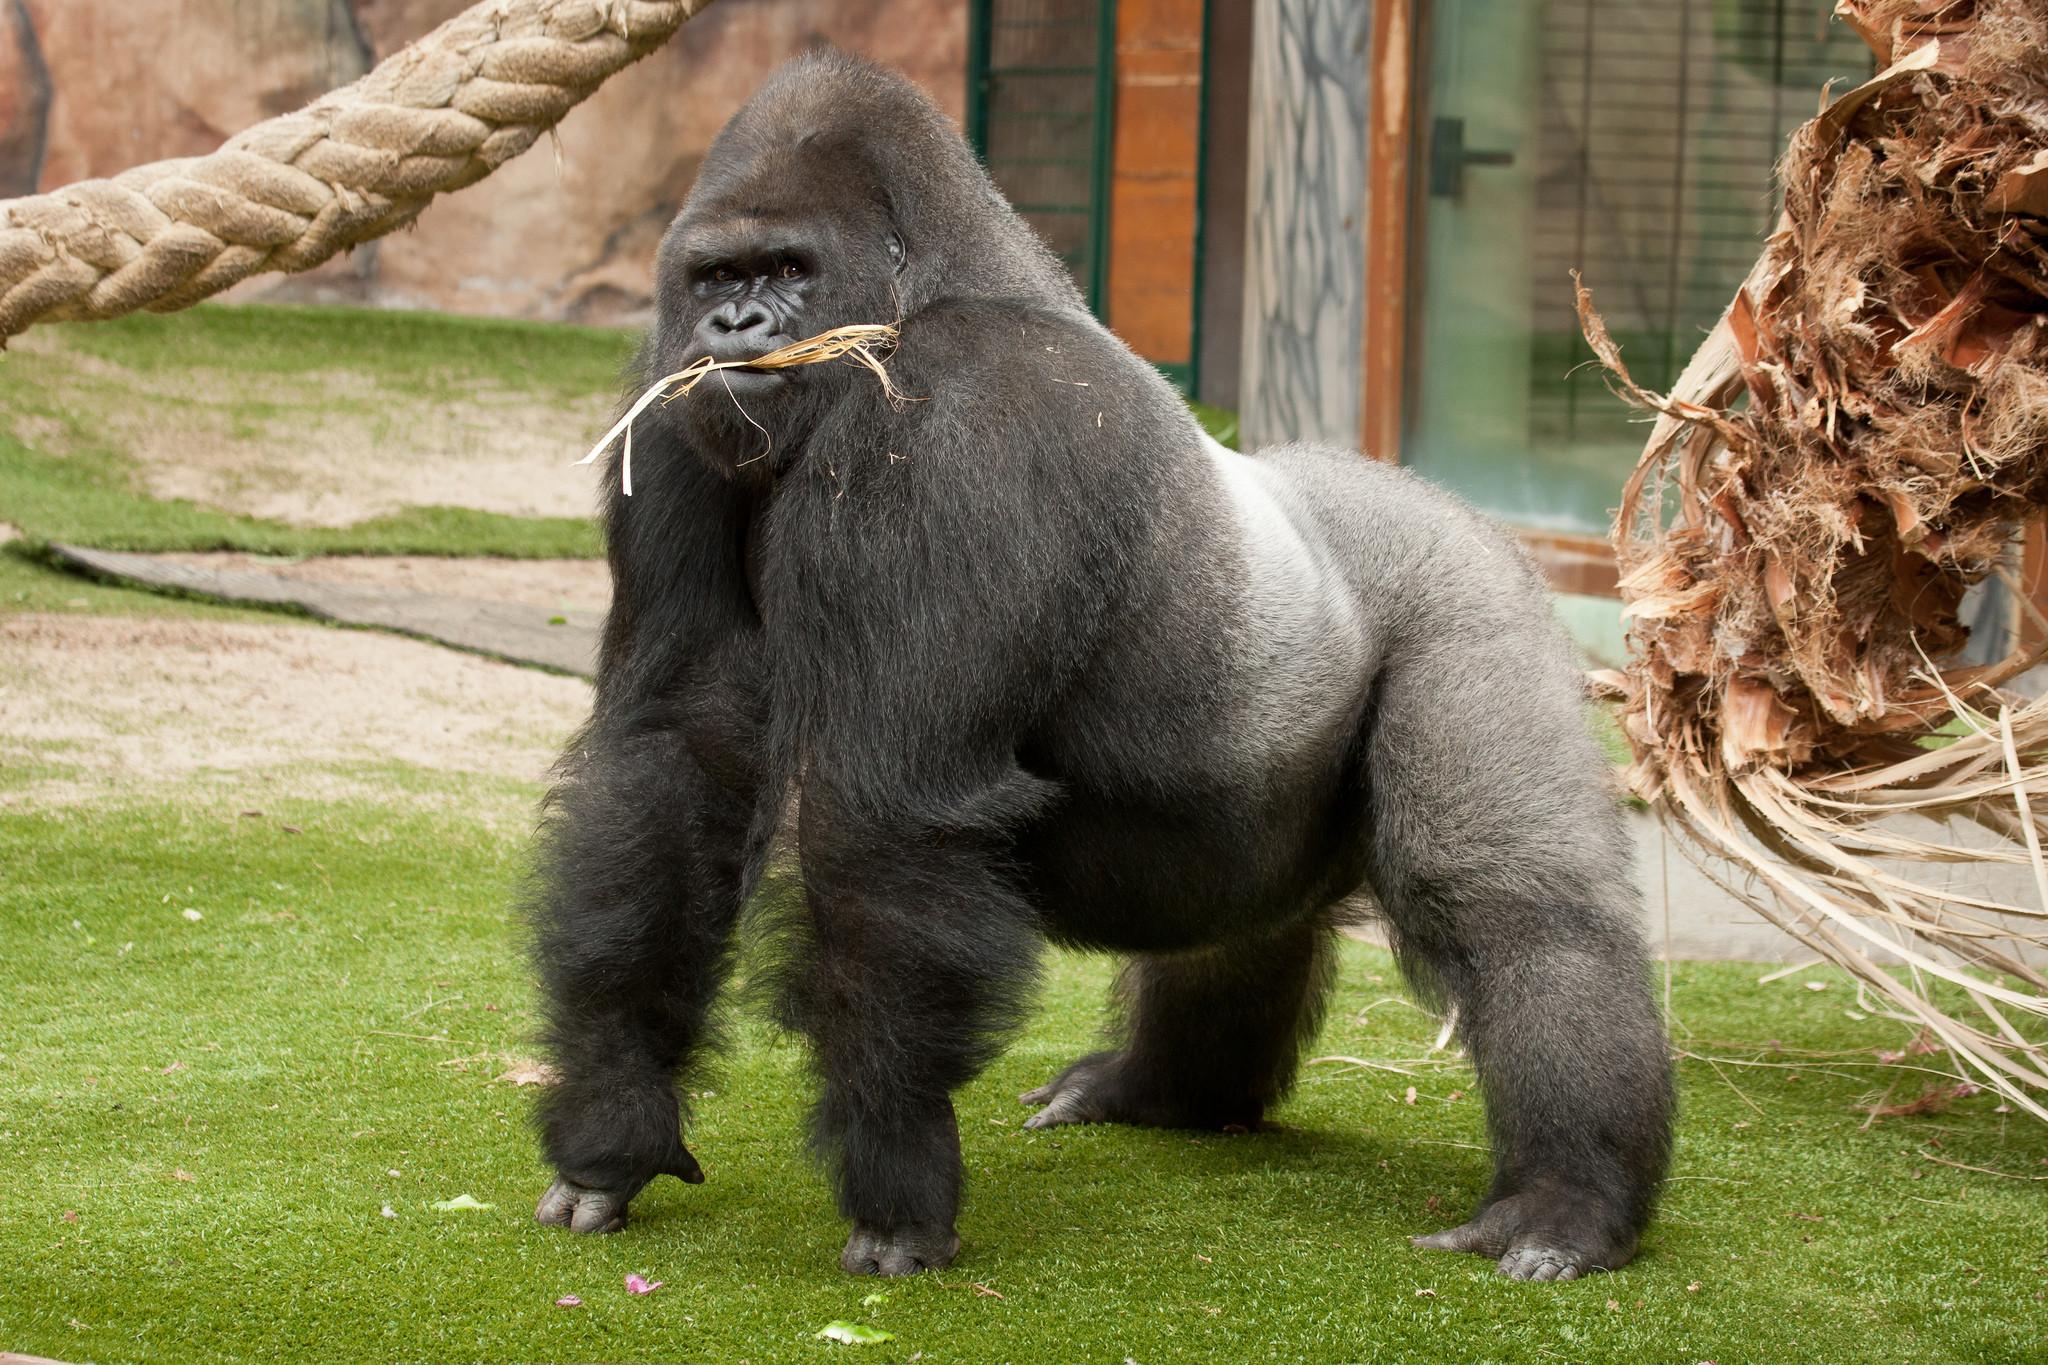 image of gorilla, gorilla vs gorilla